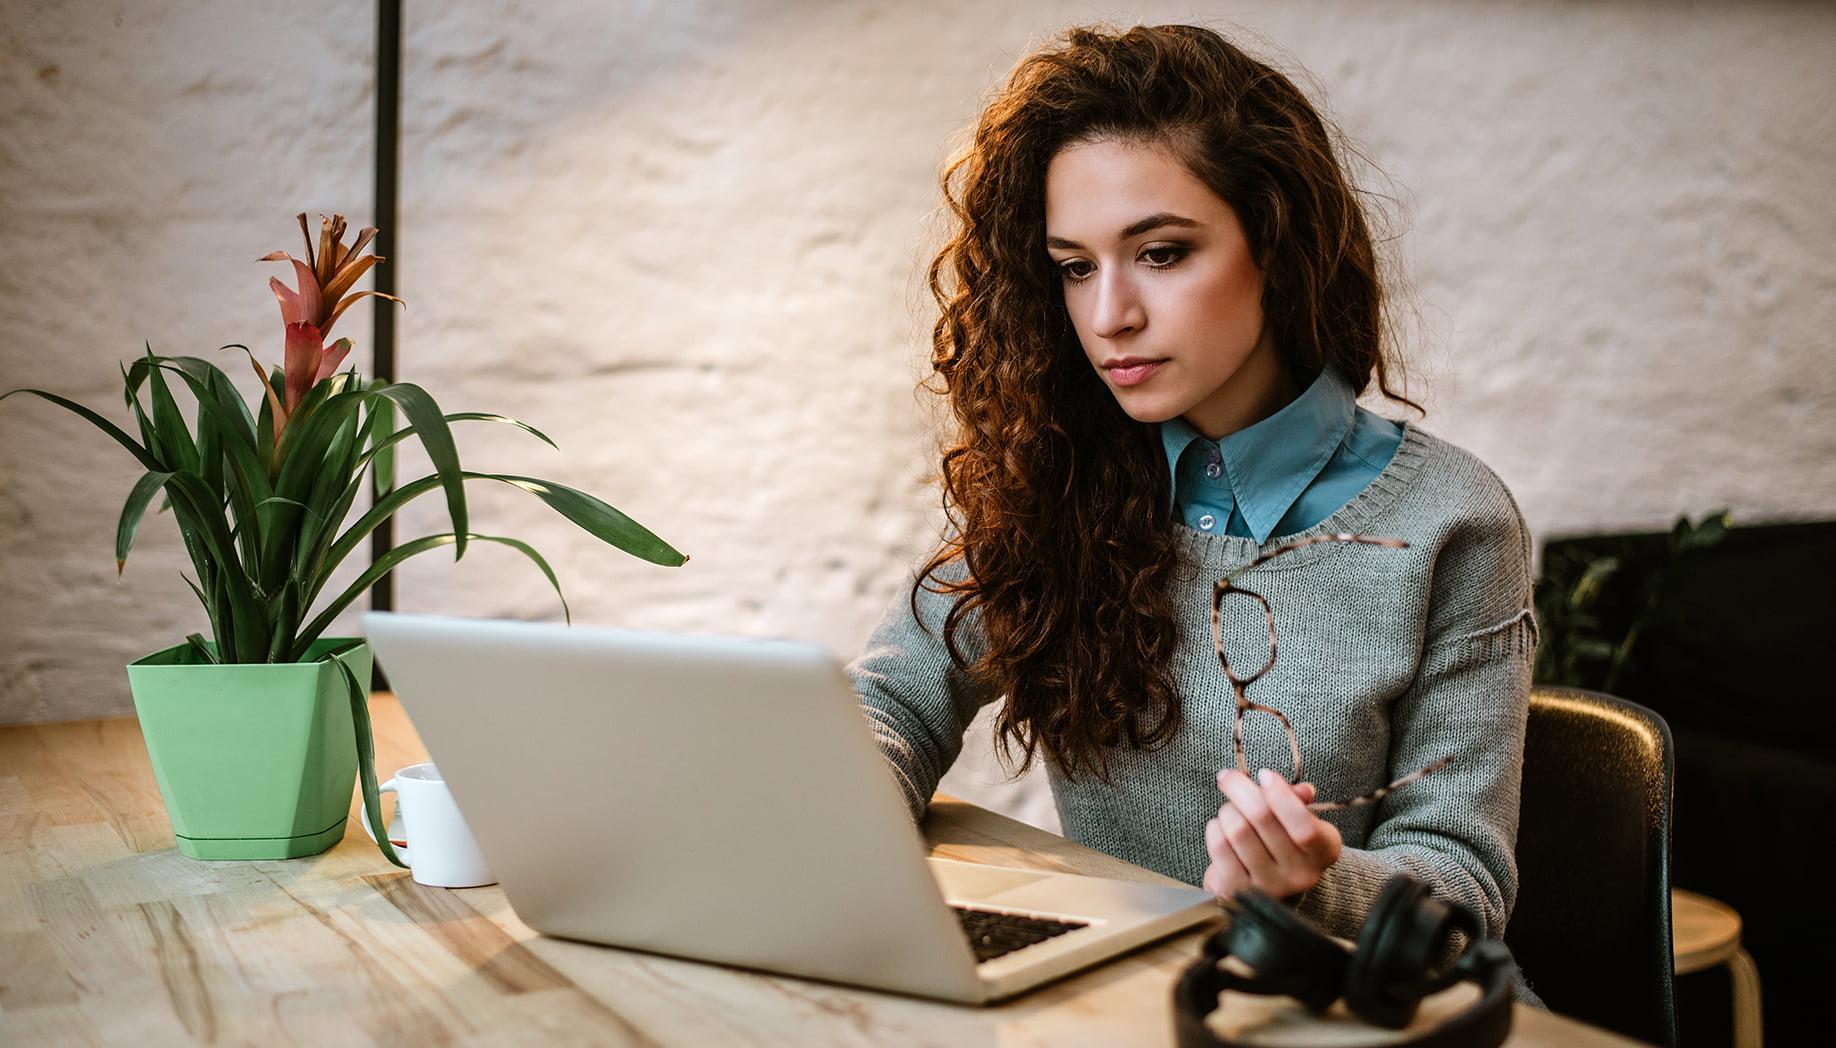 Mac's List customer video tutorials